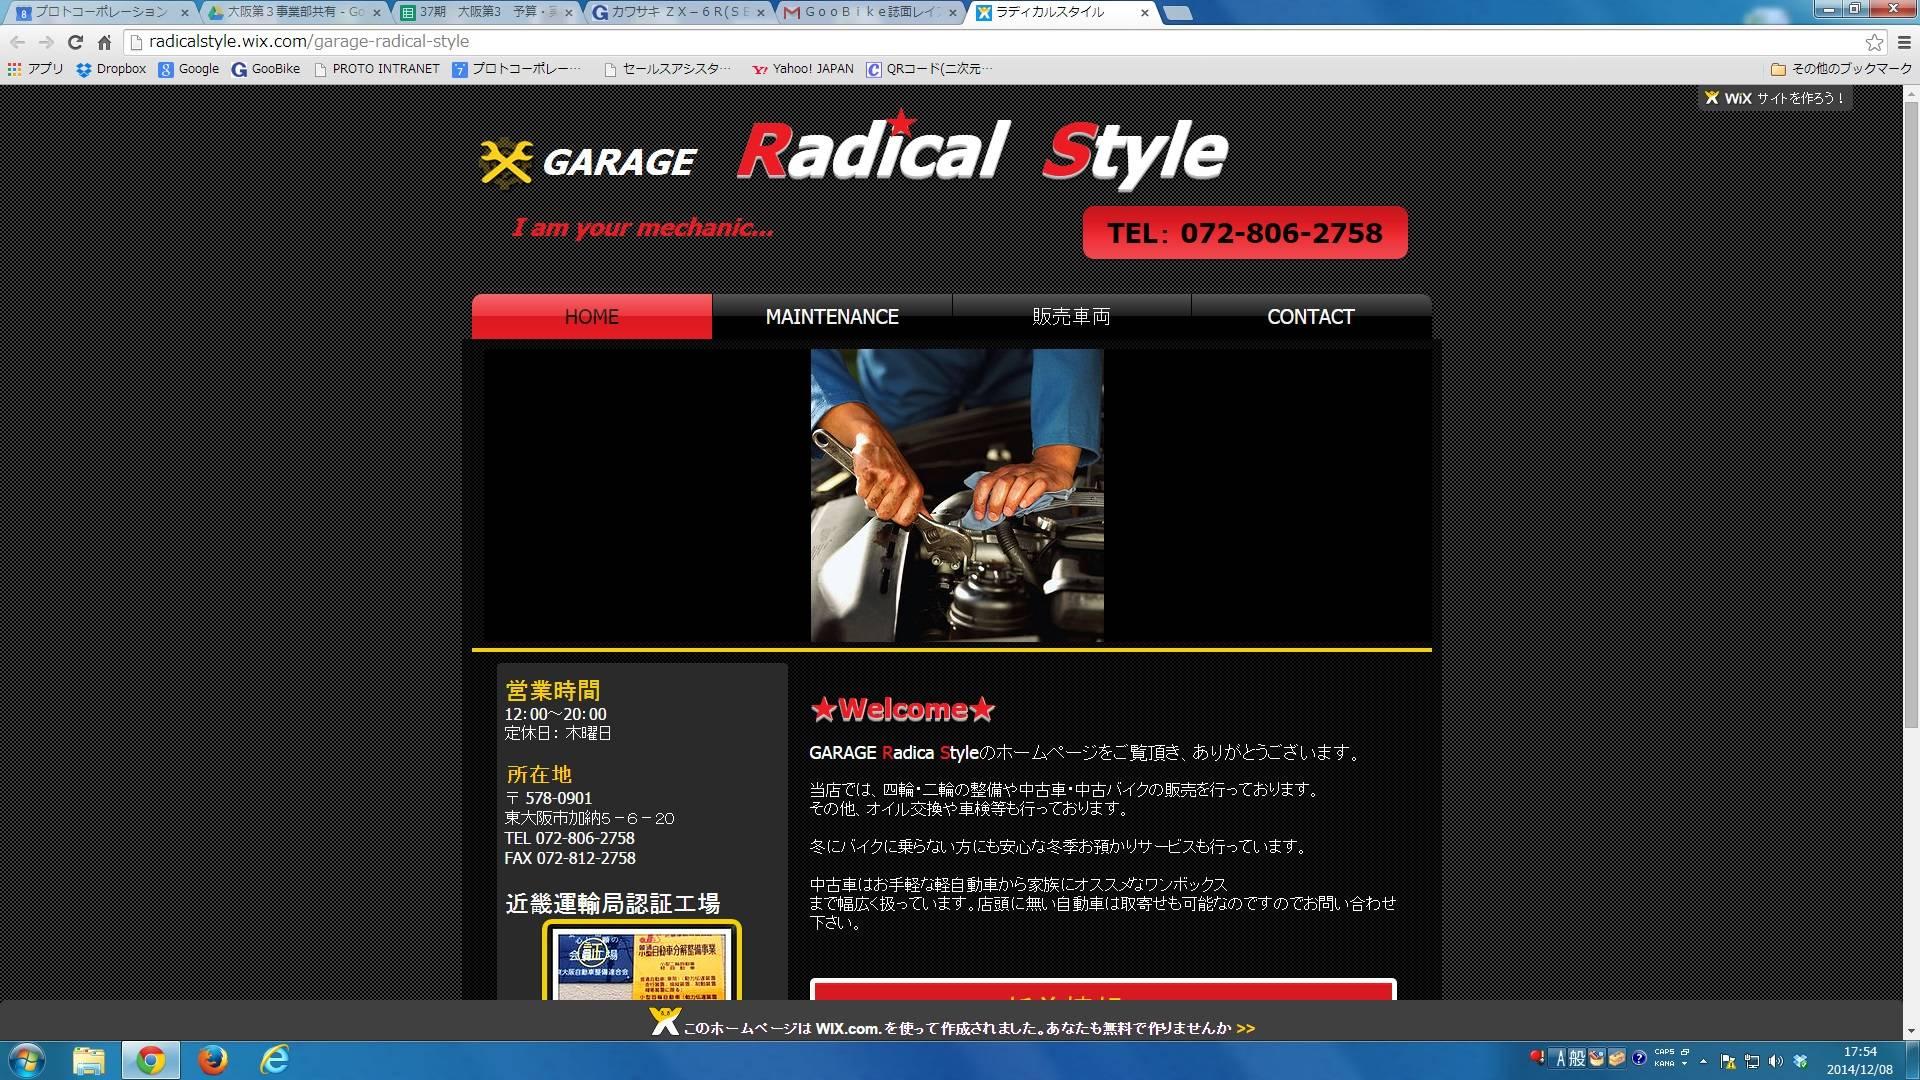 GARAGE Radical Style